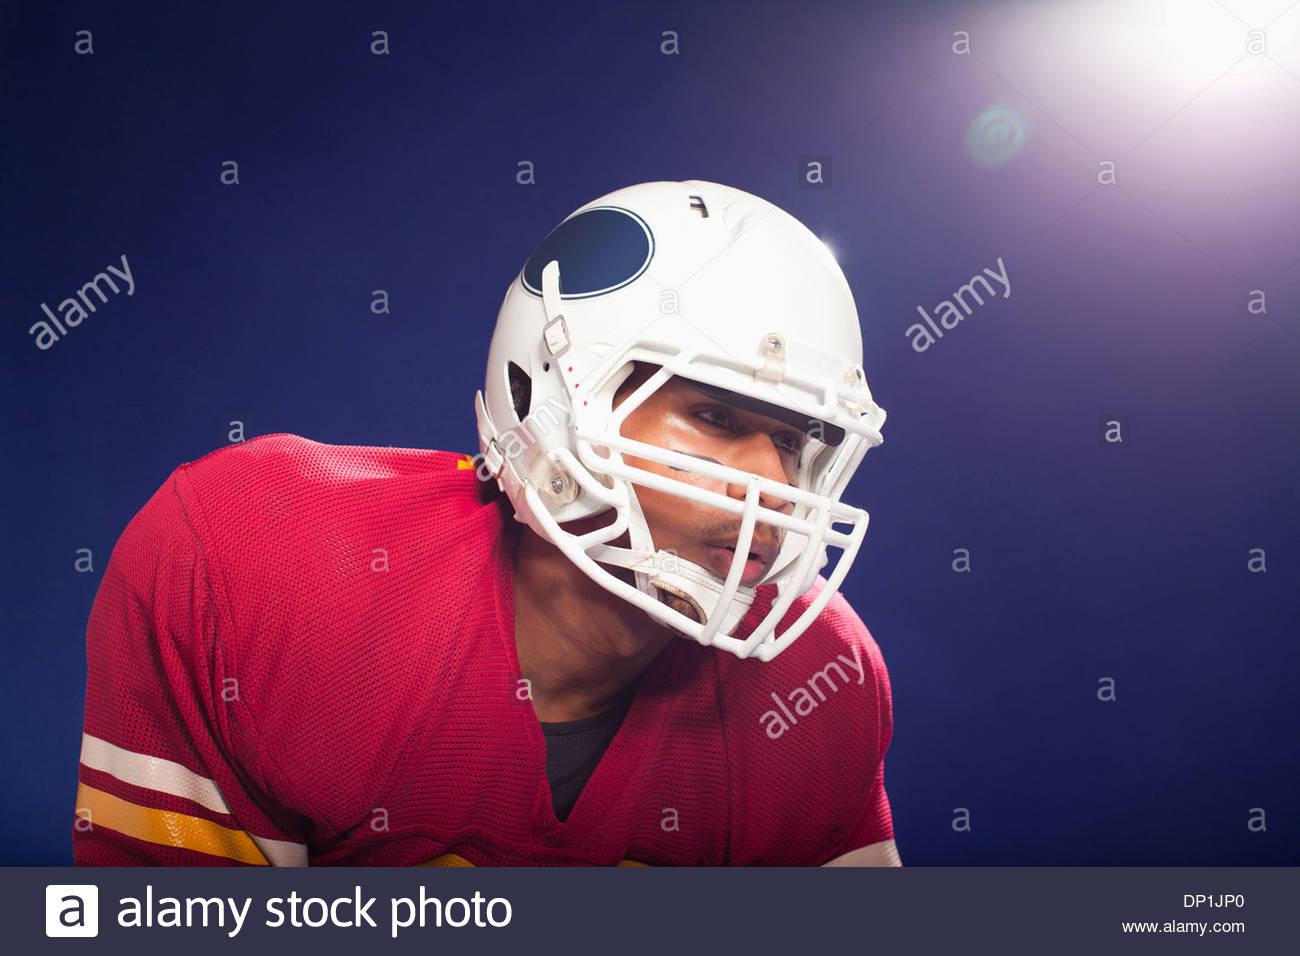 Football player wearing helmet - Stock Image